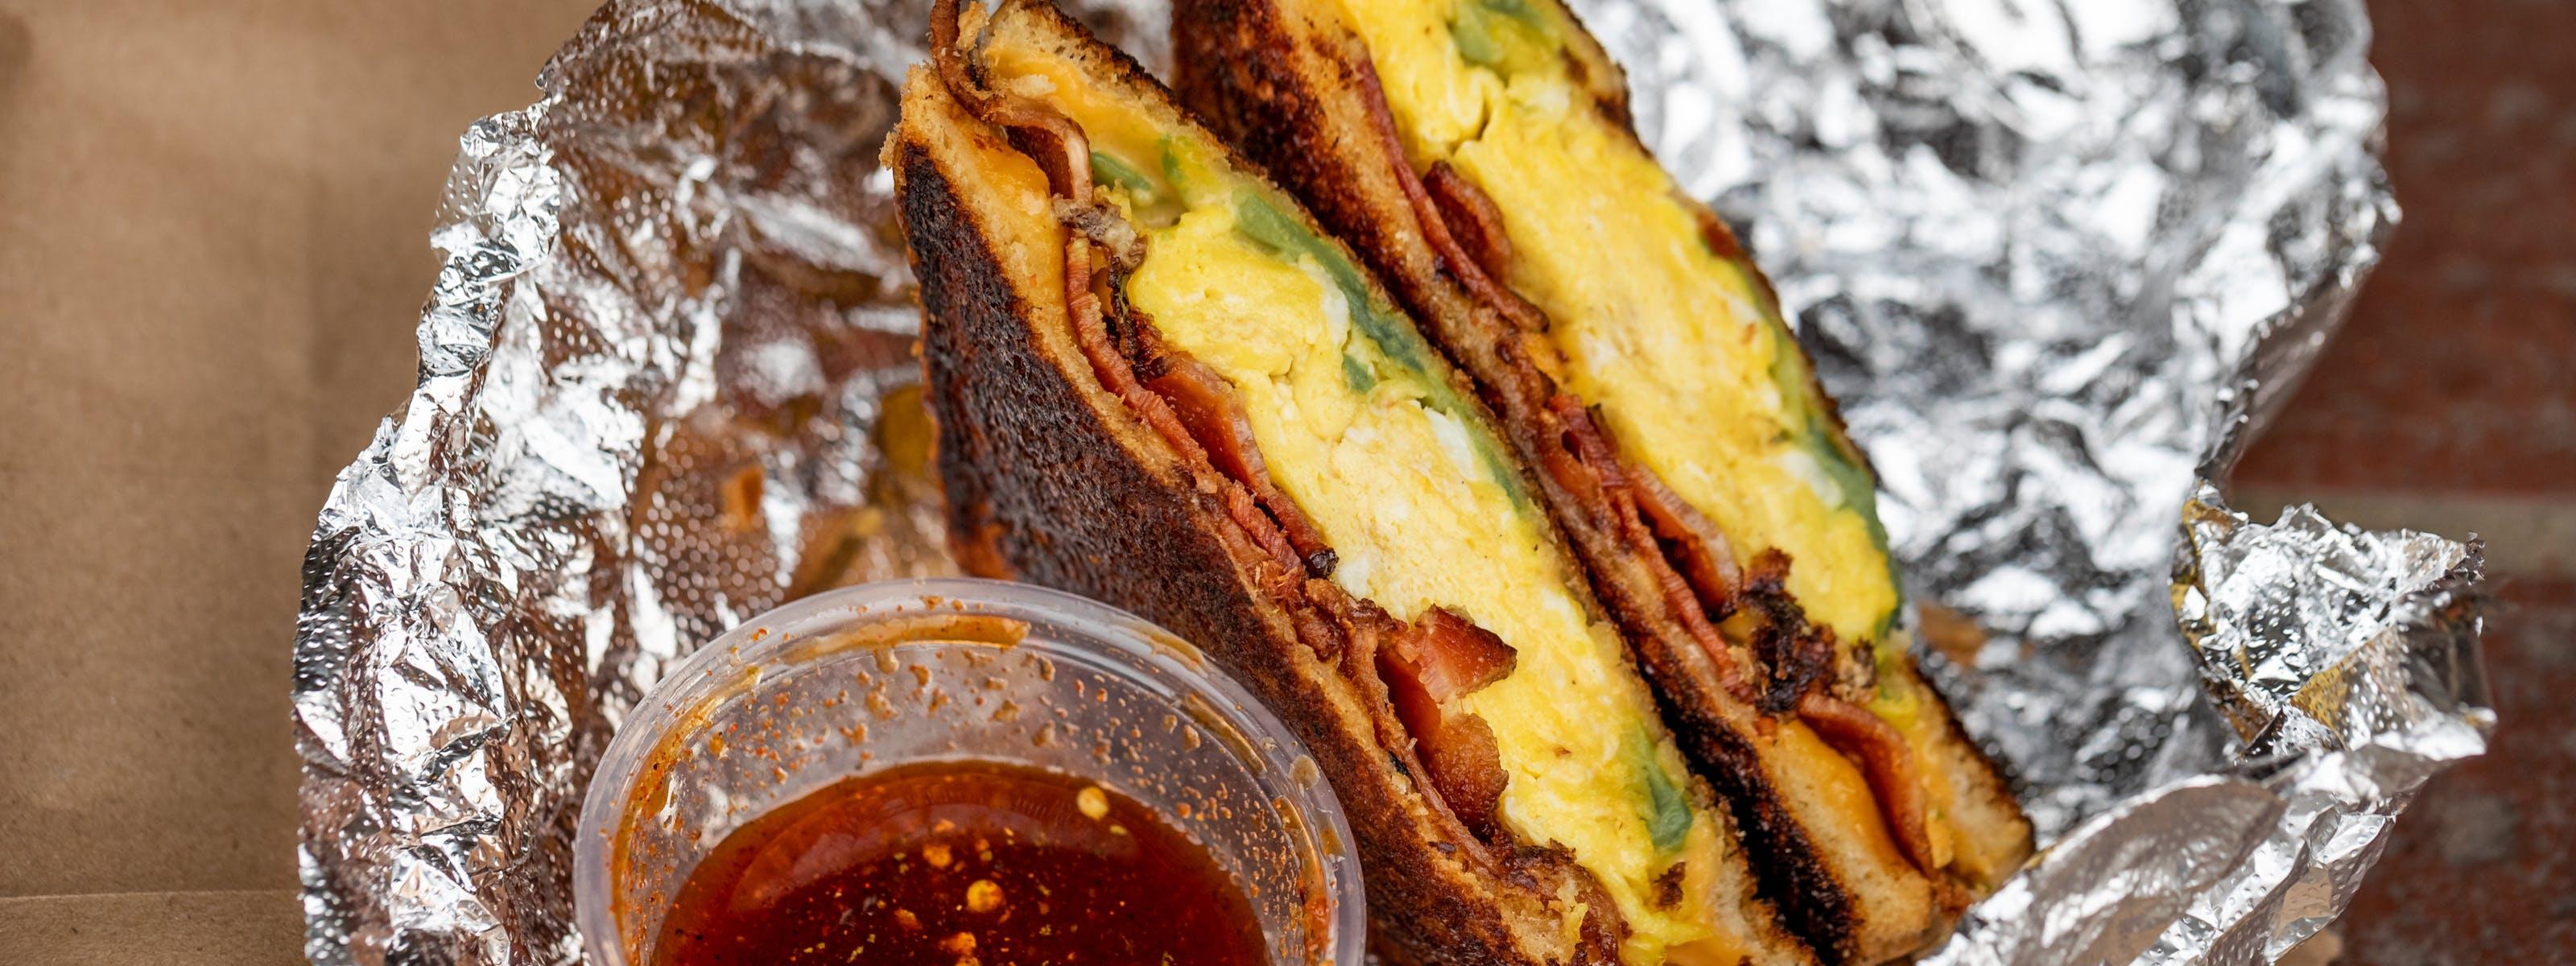 The Best Breakfast Sandwiches In LA - Los Angeles - The Infatuation